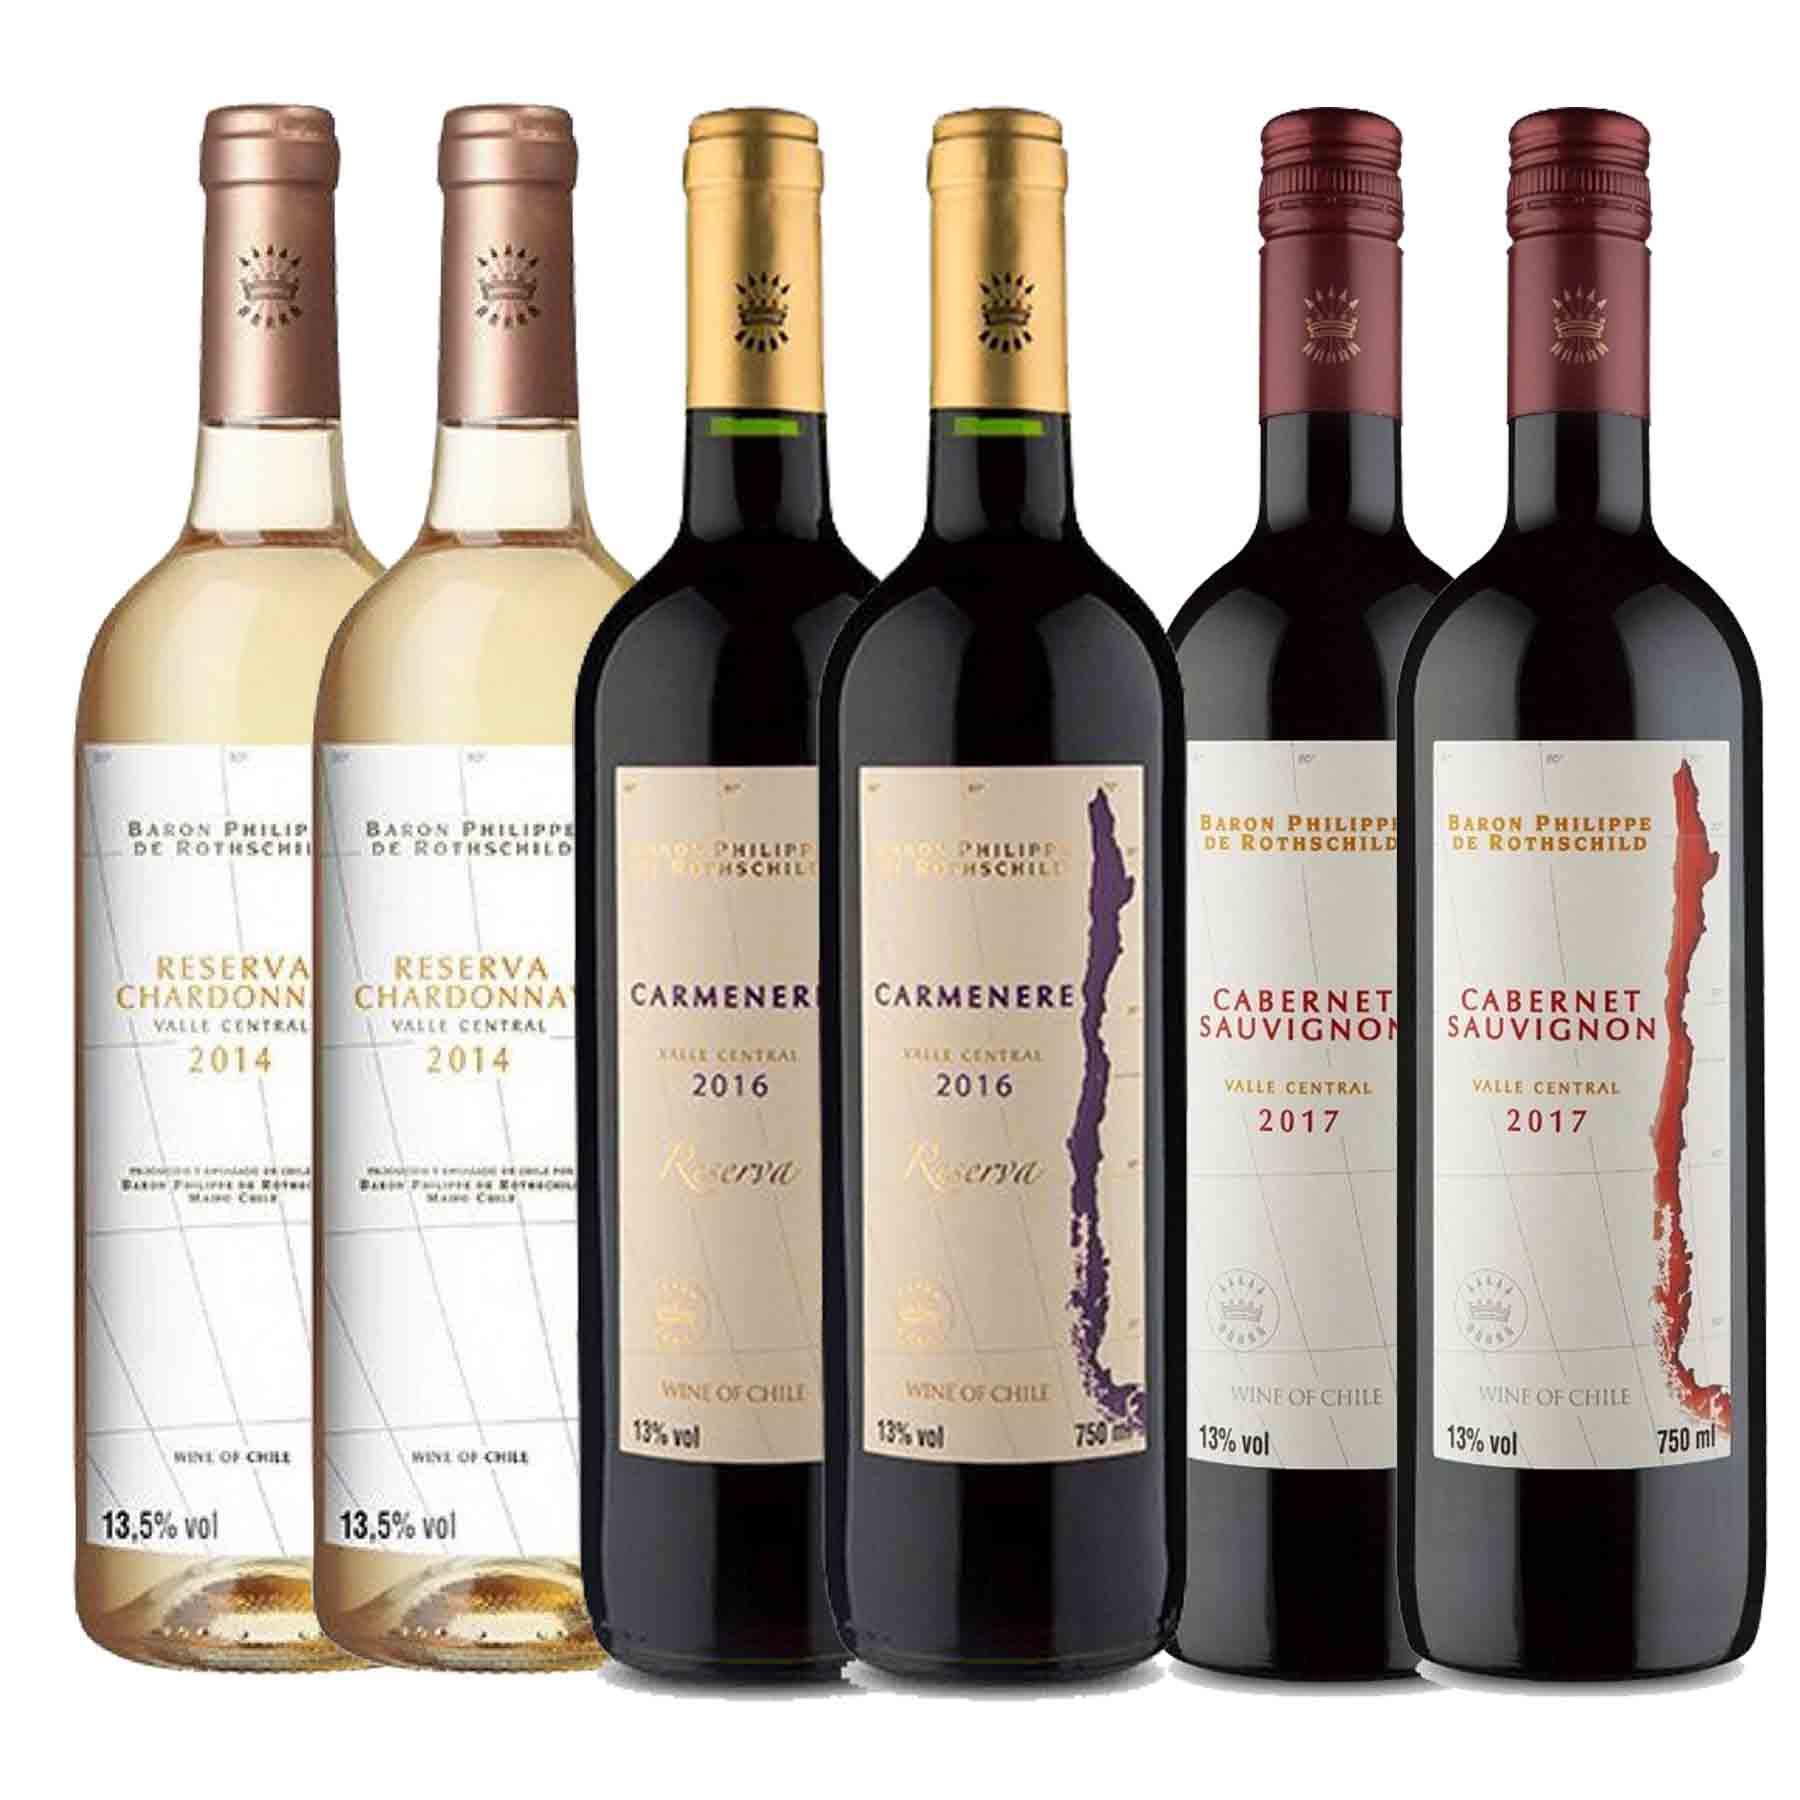 Kit 6x Vinho Tinto/Branco Chileno Baron Philippe de Rothschild Reserva Carmenere, Cabernet Sauvignon e Chardonnay 2019